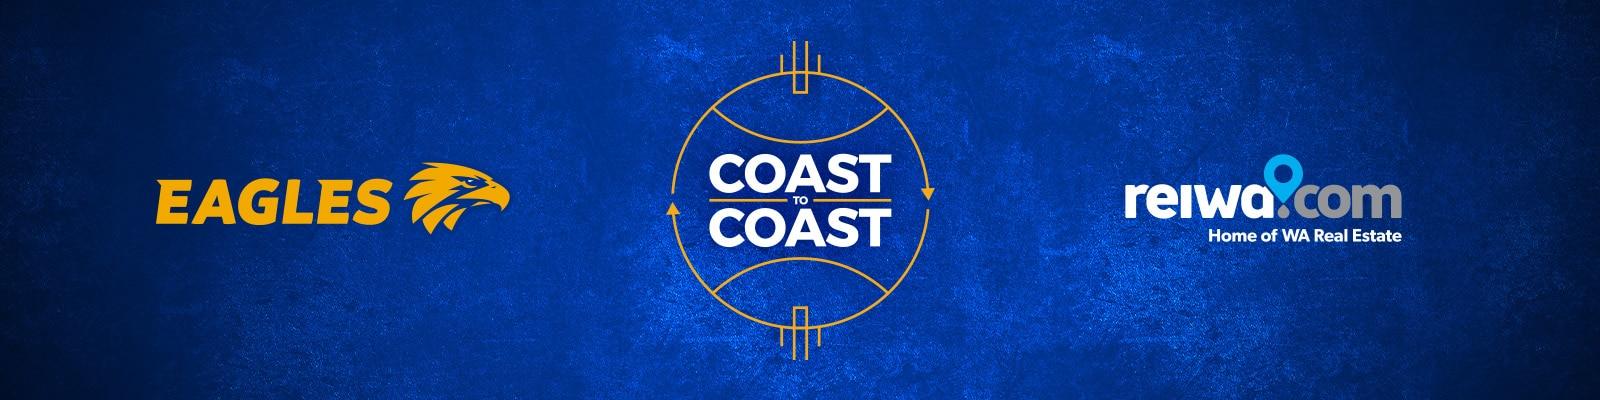 CoastToCoast-1600x400-reiwa.jpg